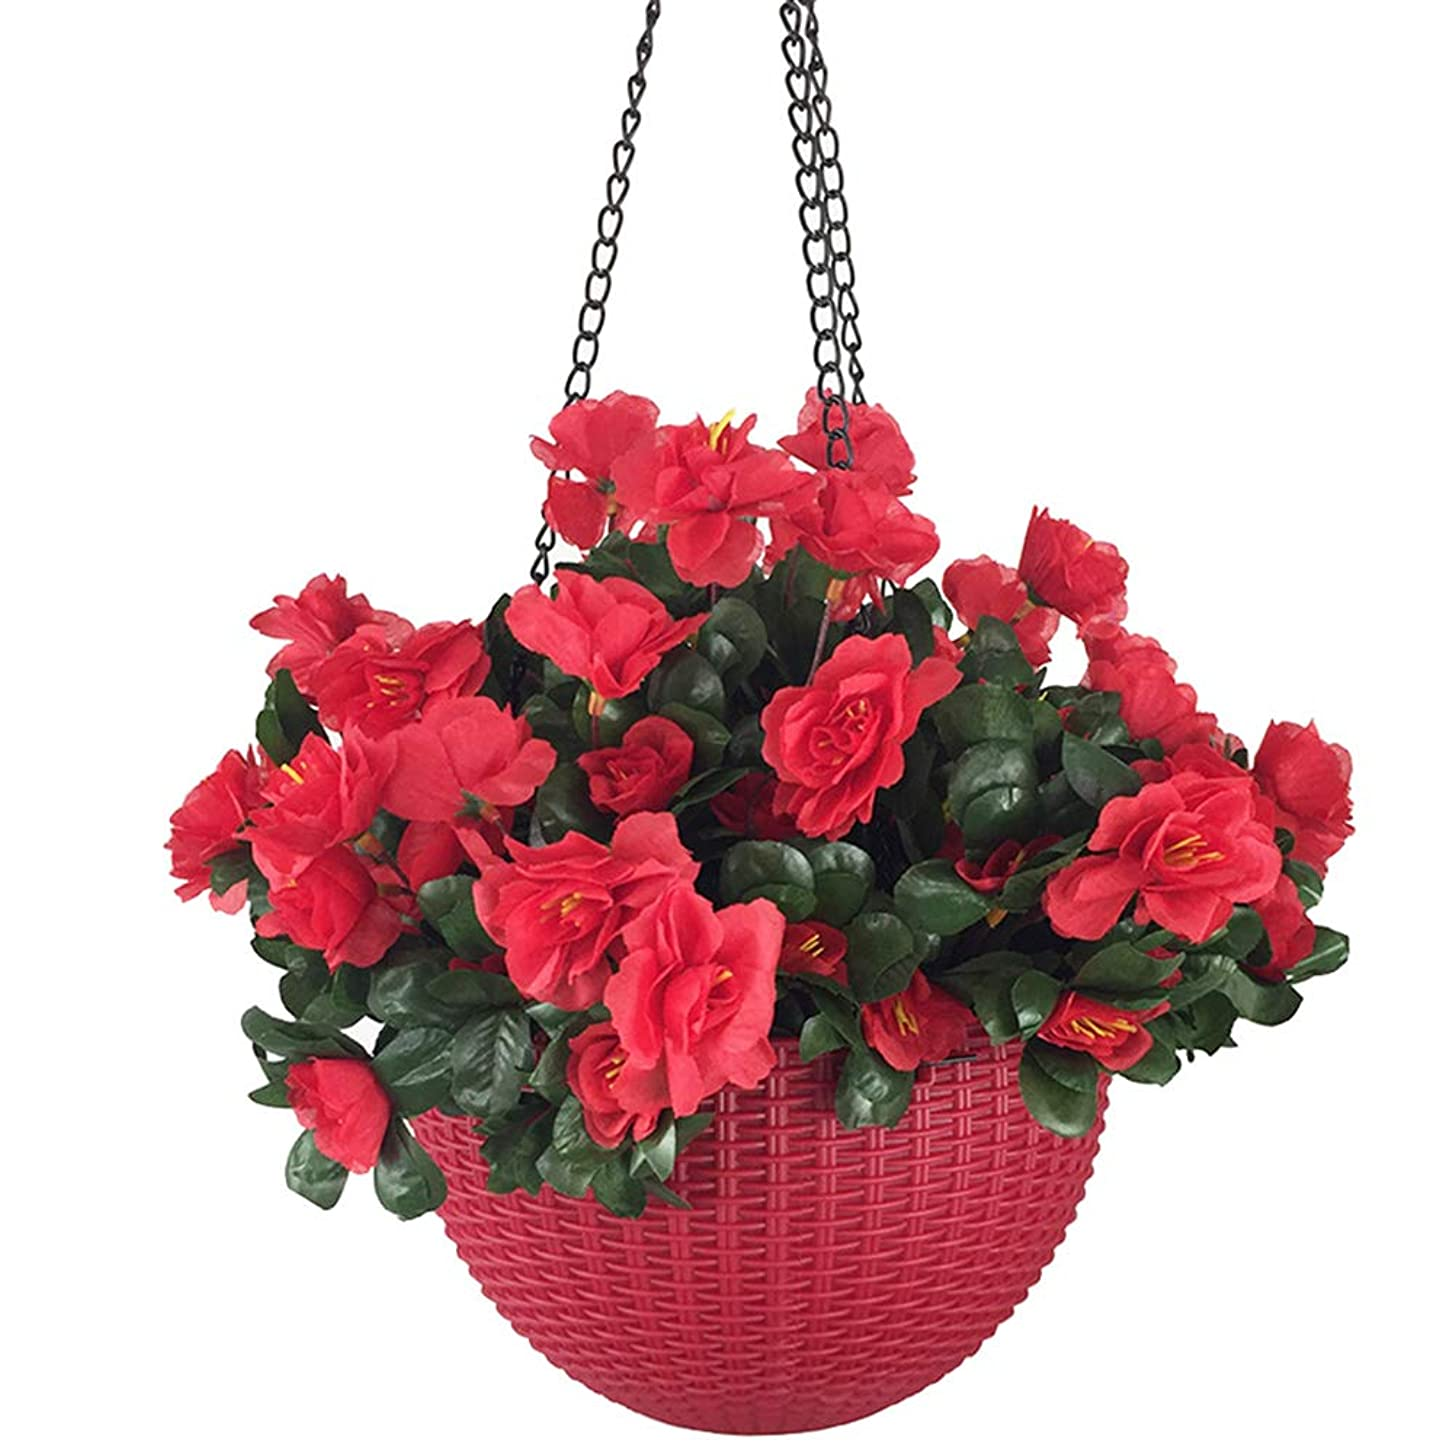 Lopkey Artificial Red Azalea Bush Flower Hanging Planter Resin Chain Hanging Basket for Indoor Outdoor Garden Porch Decor